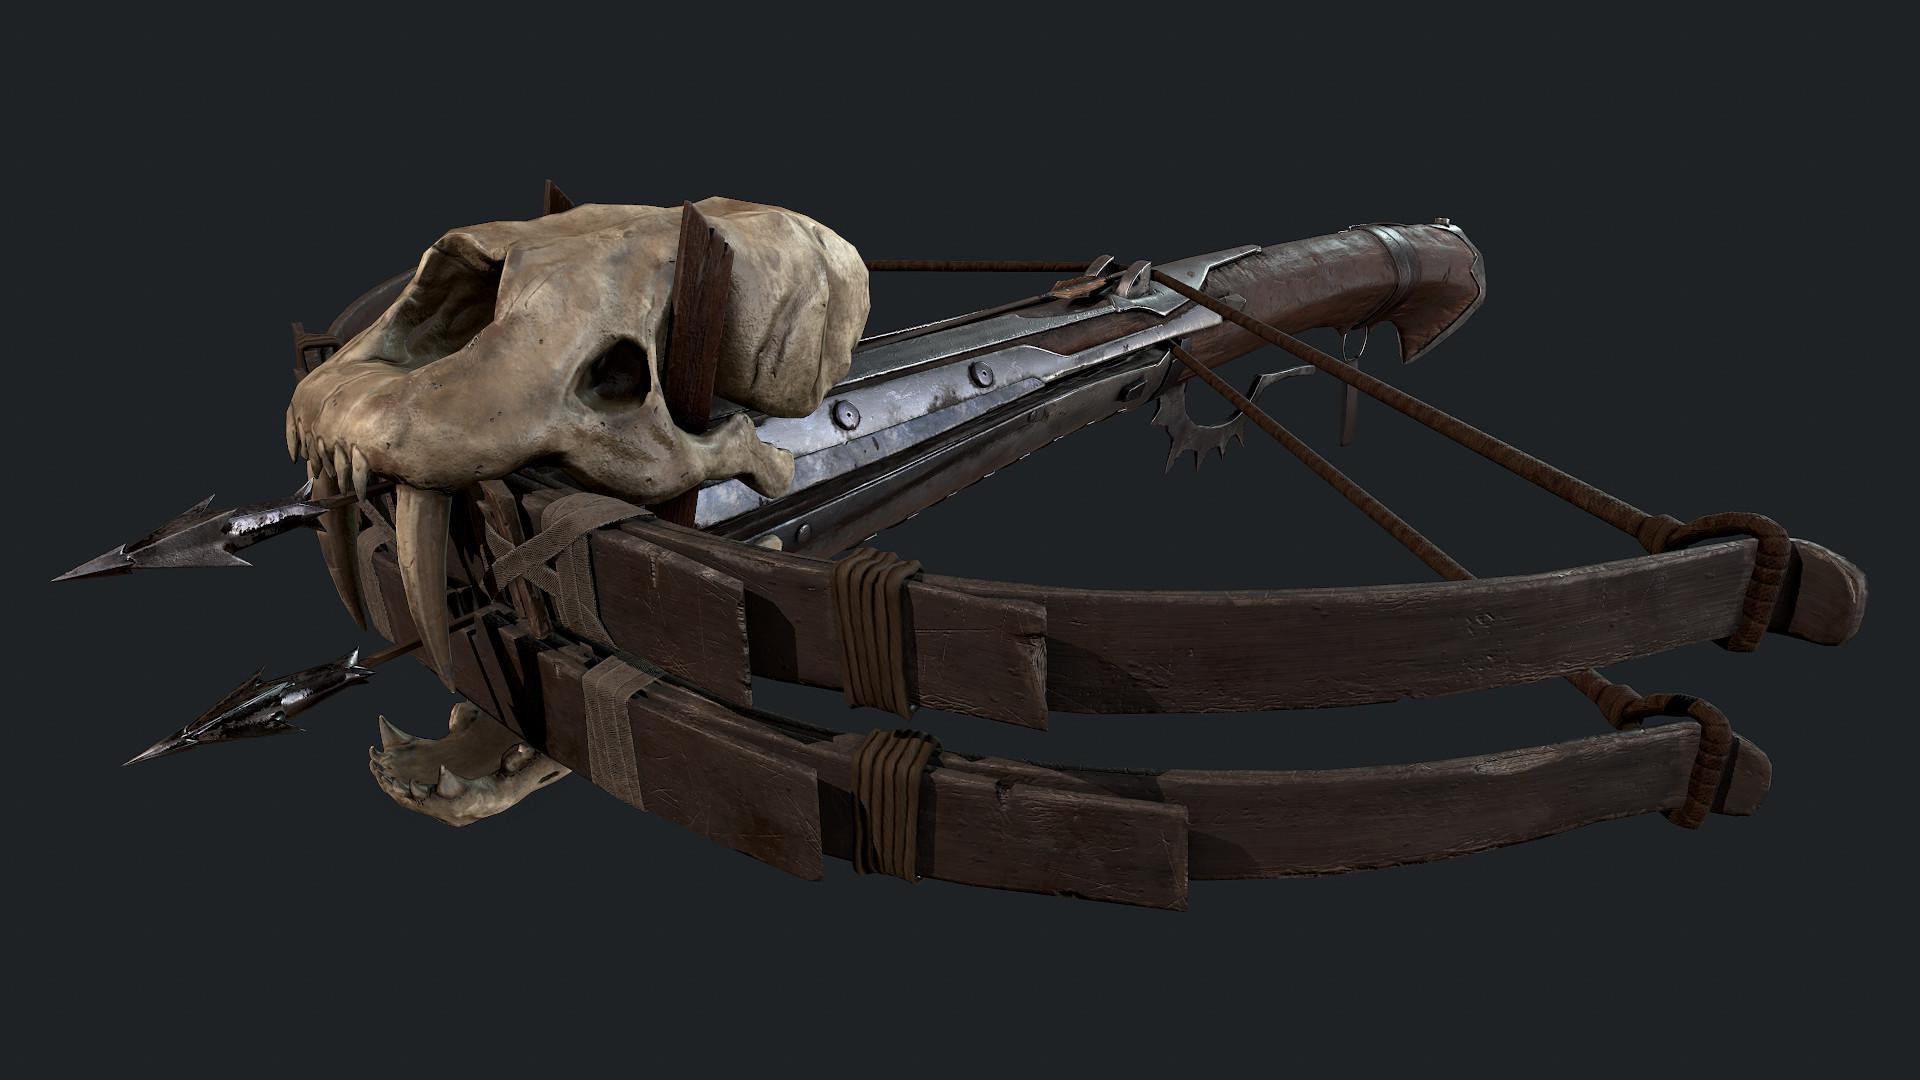 ArtStation - Medieval crossbow, Leo Coto